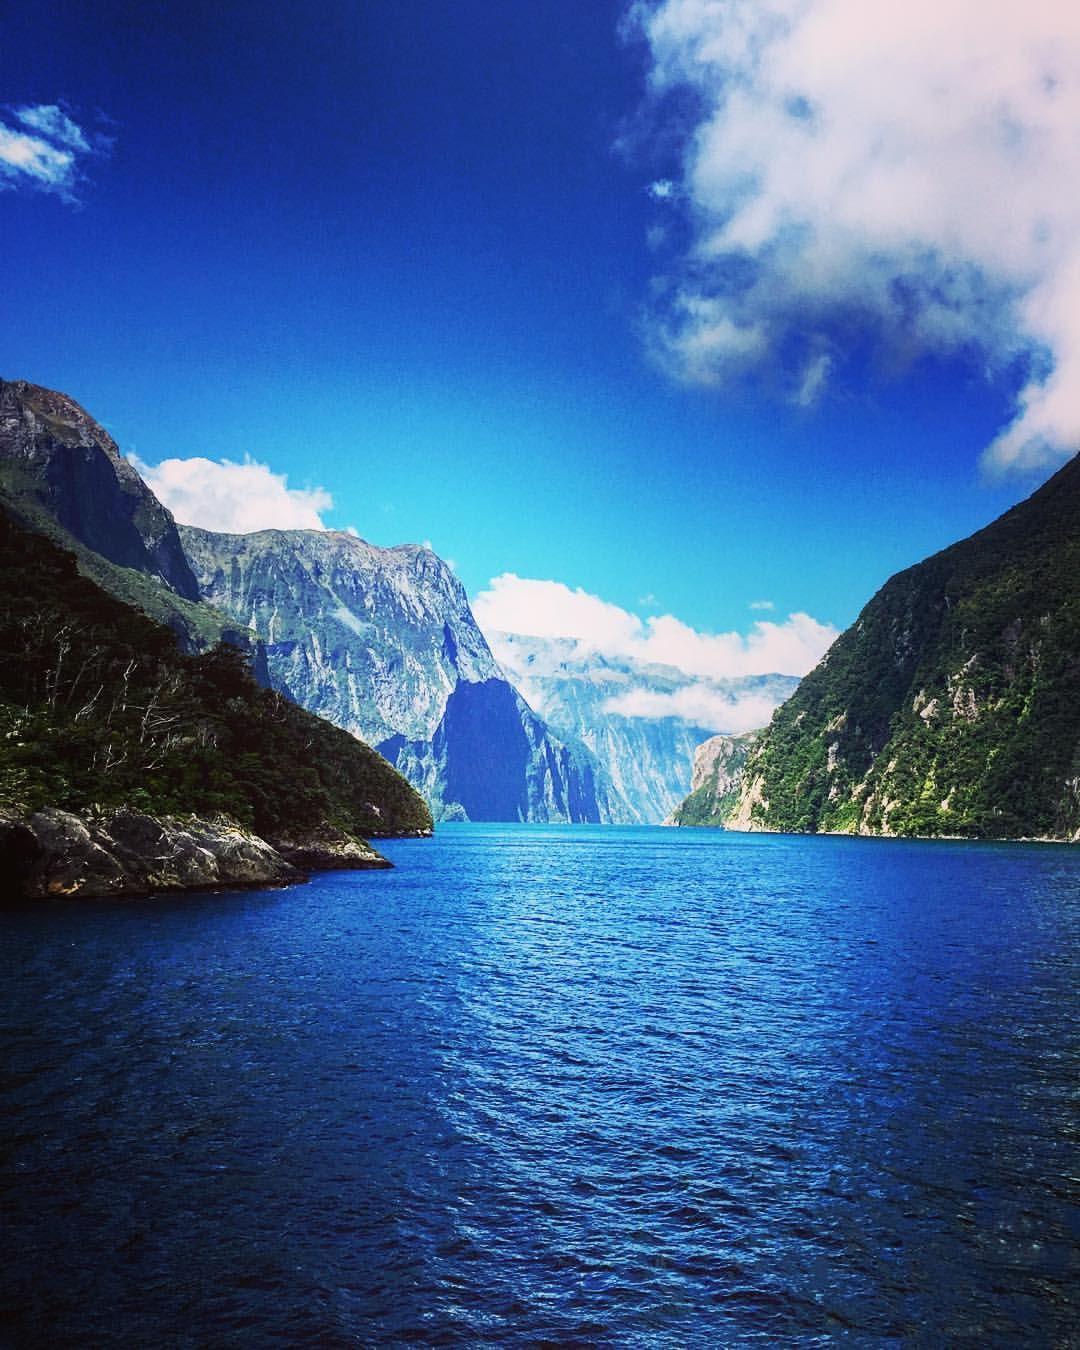 Travel Blogger, Digital Nomad